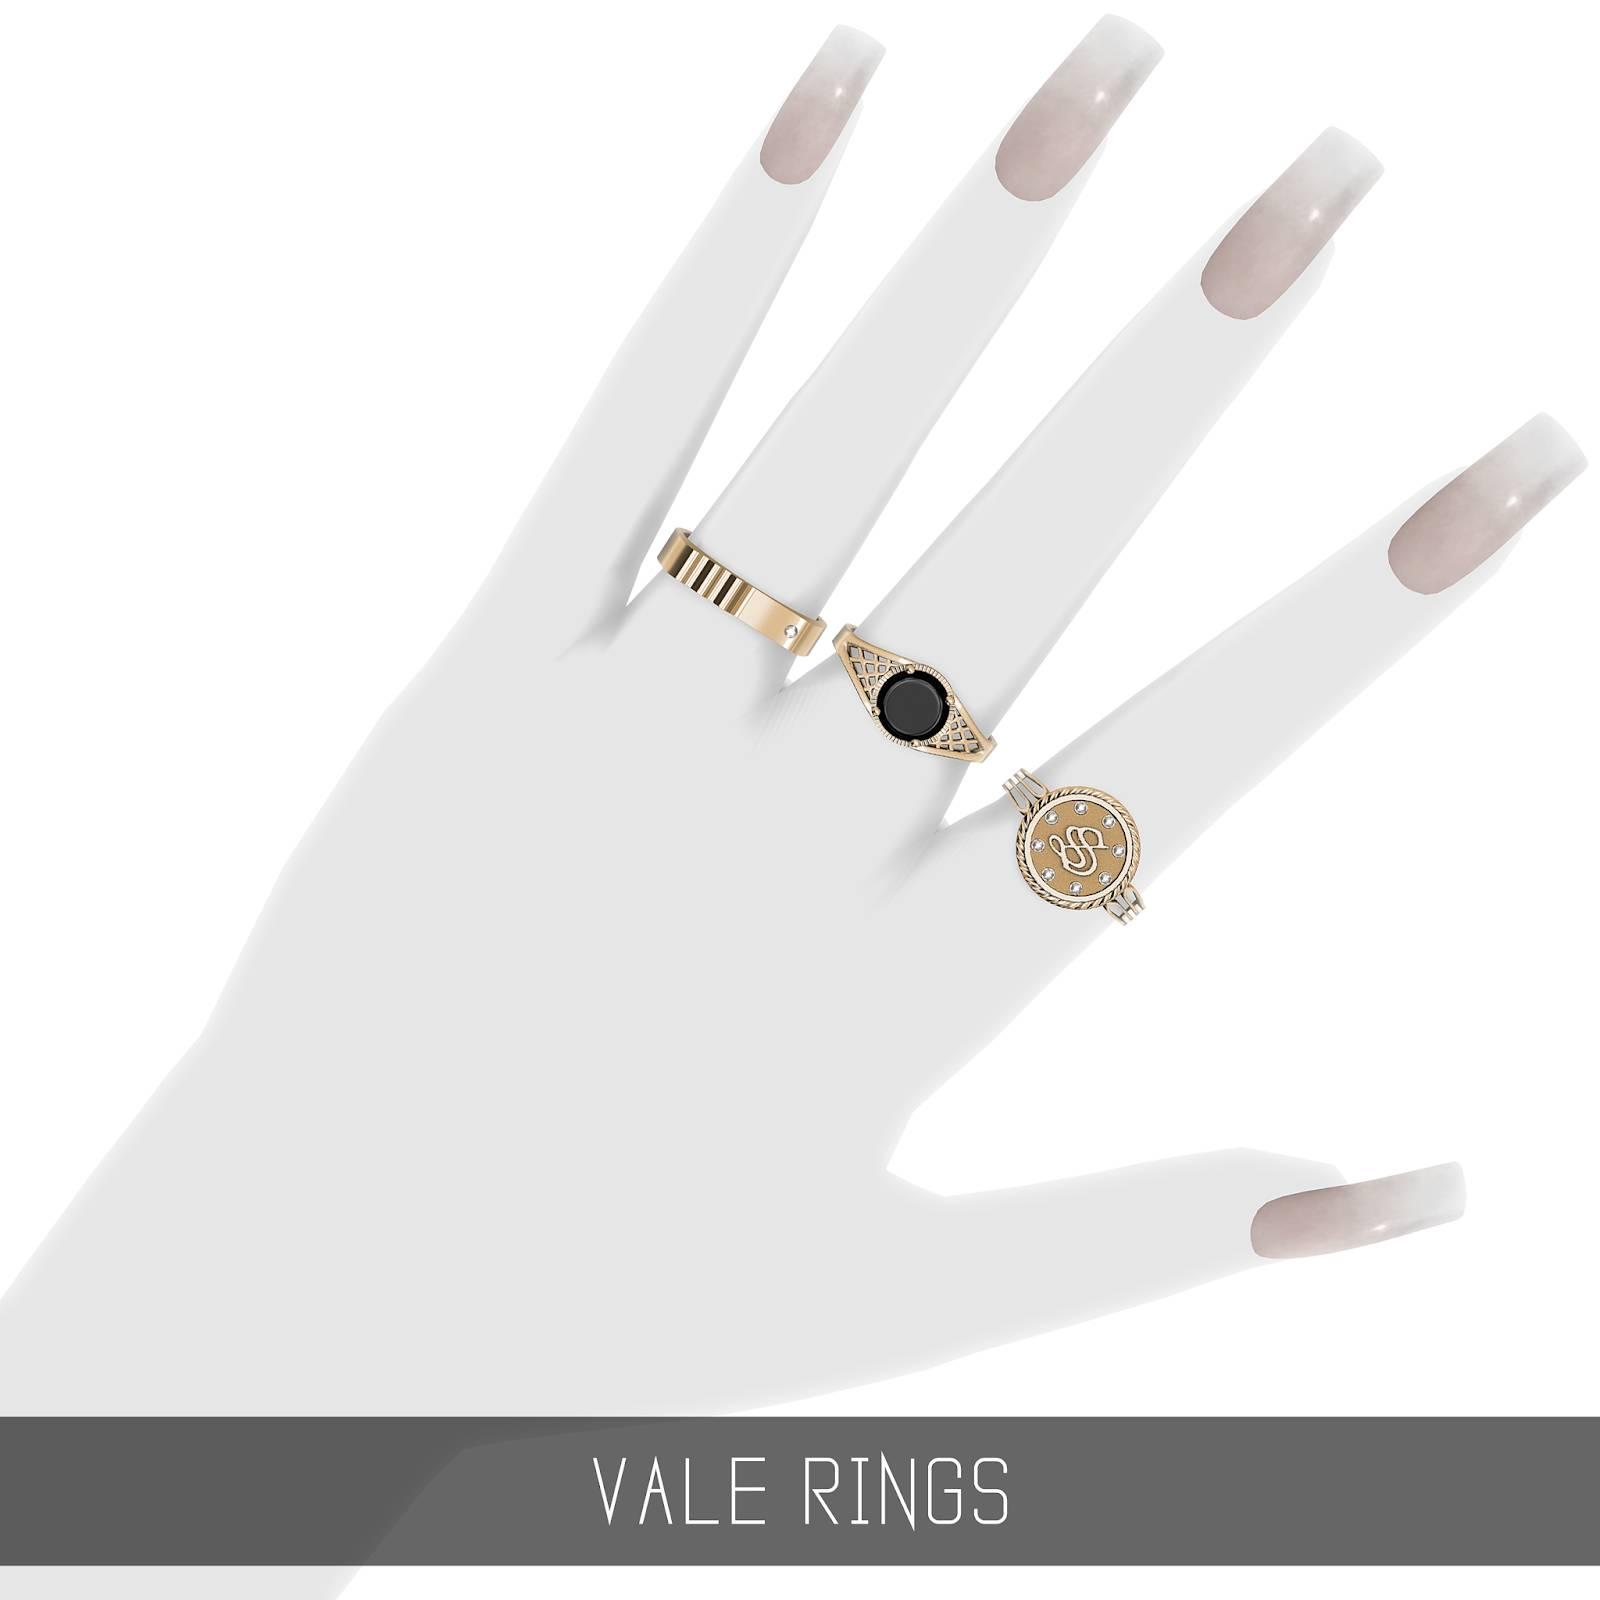 Комплект колец - VALE RINGS